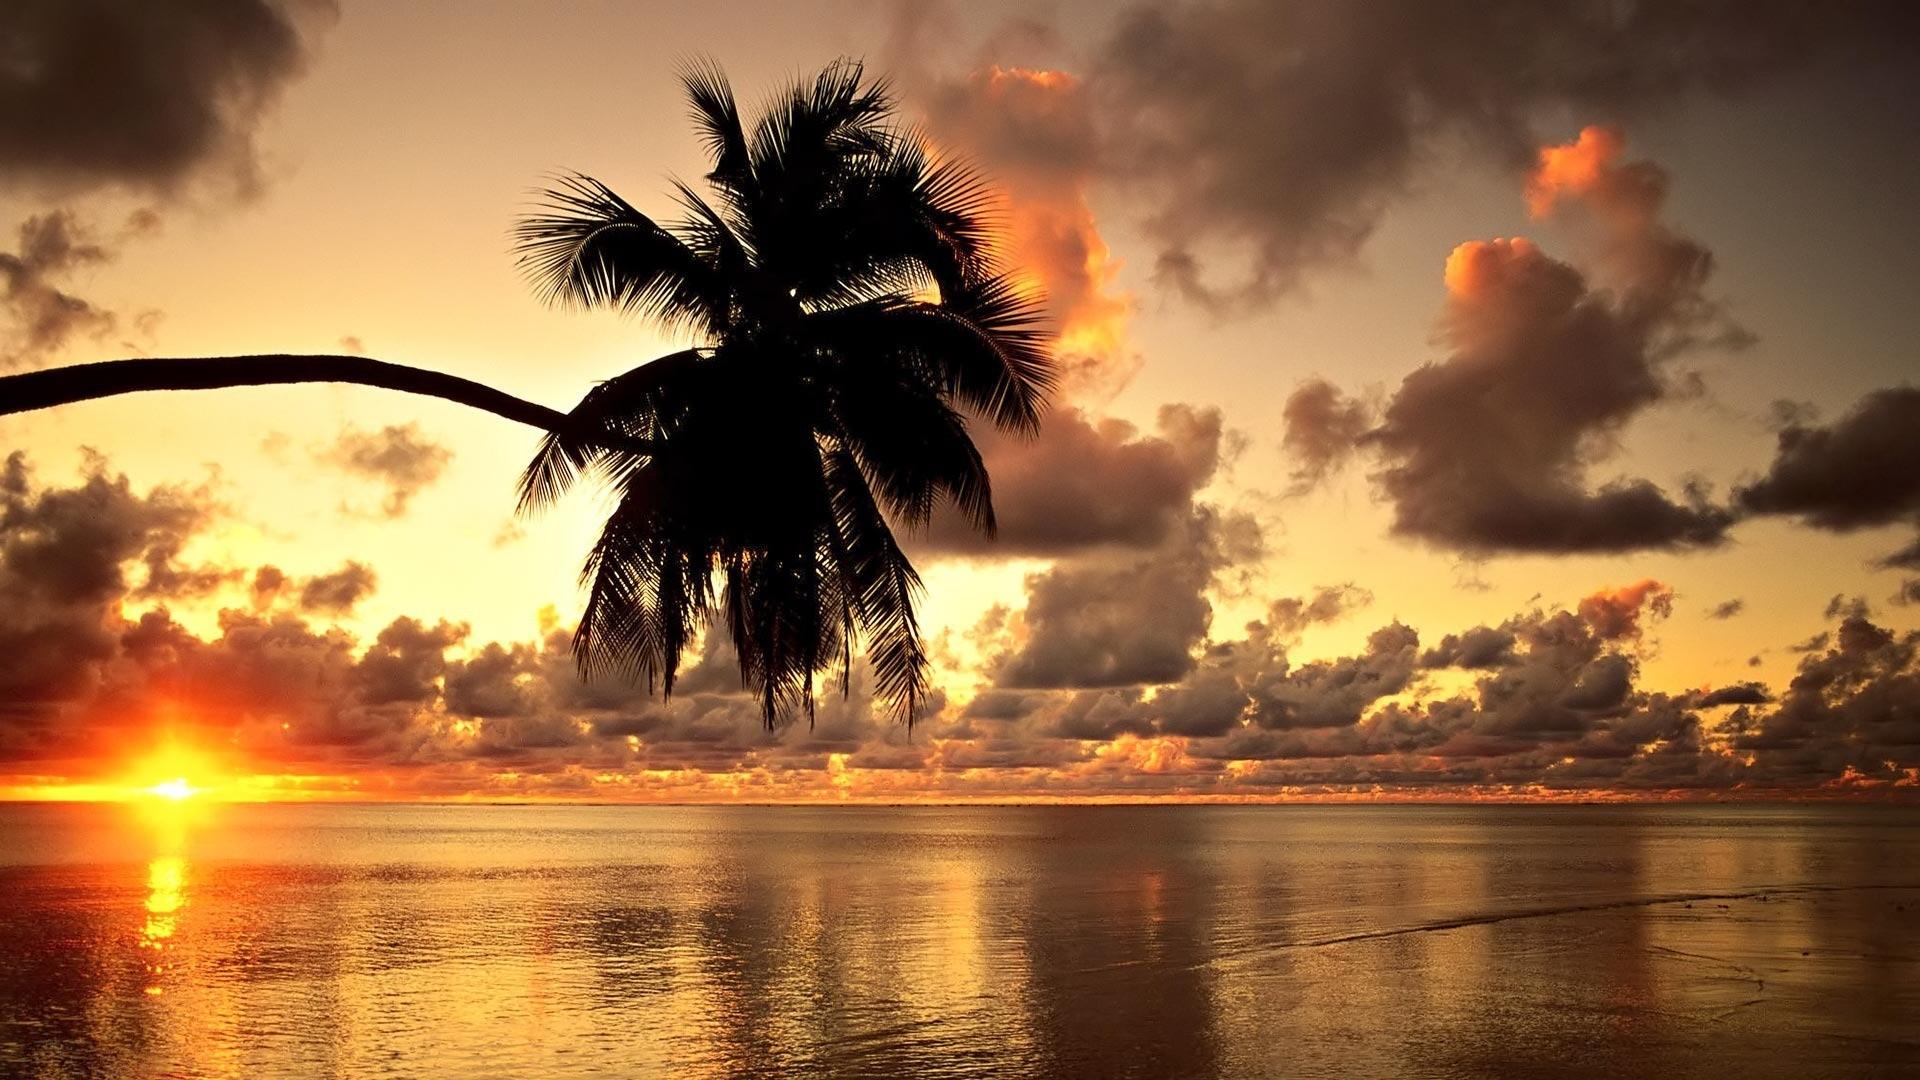 Res: 1920x1080, Hawaii Sunset Wallpaper 1080p